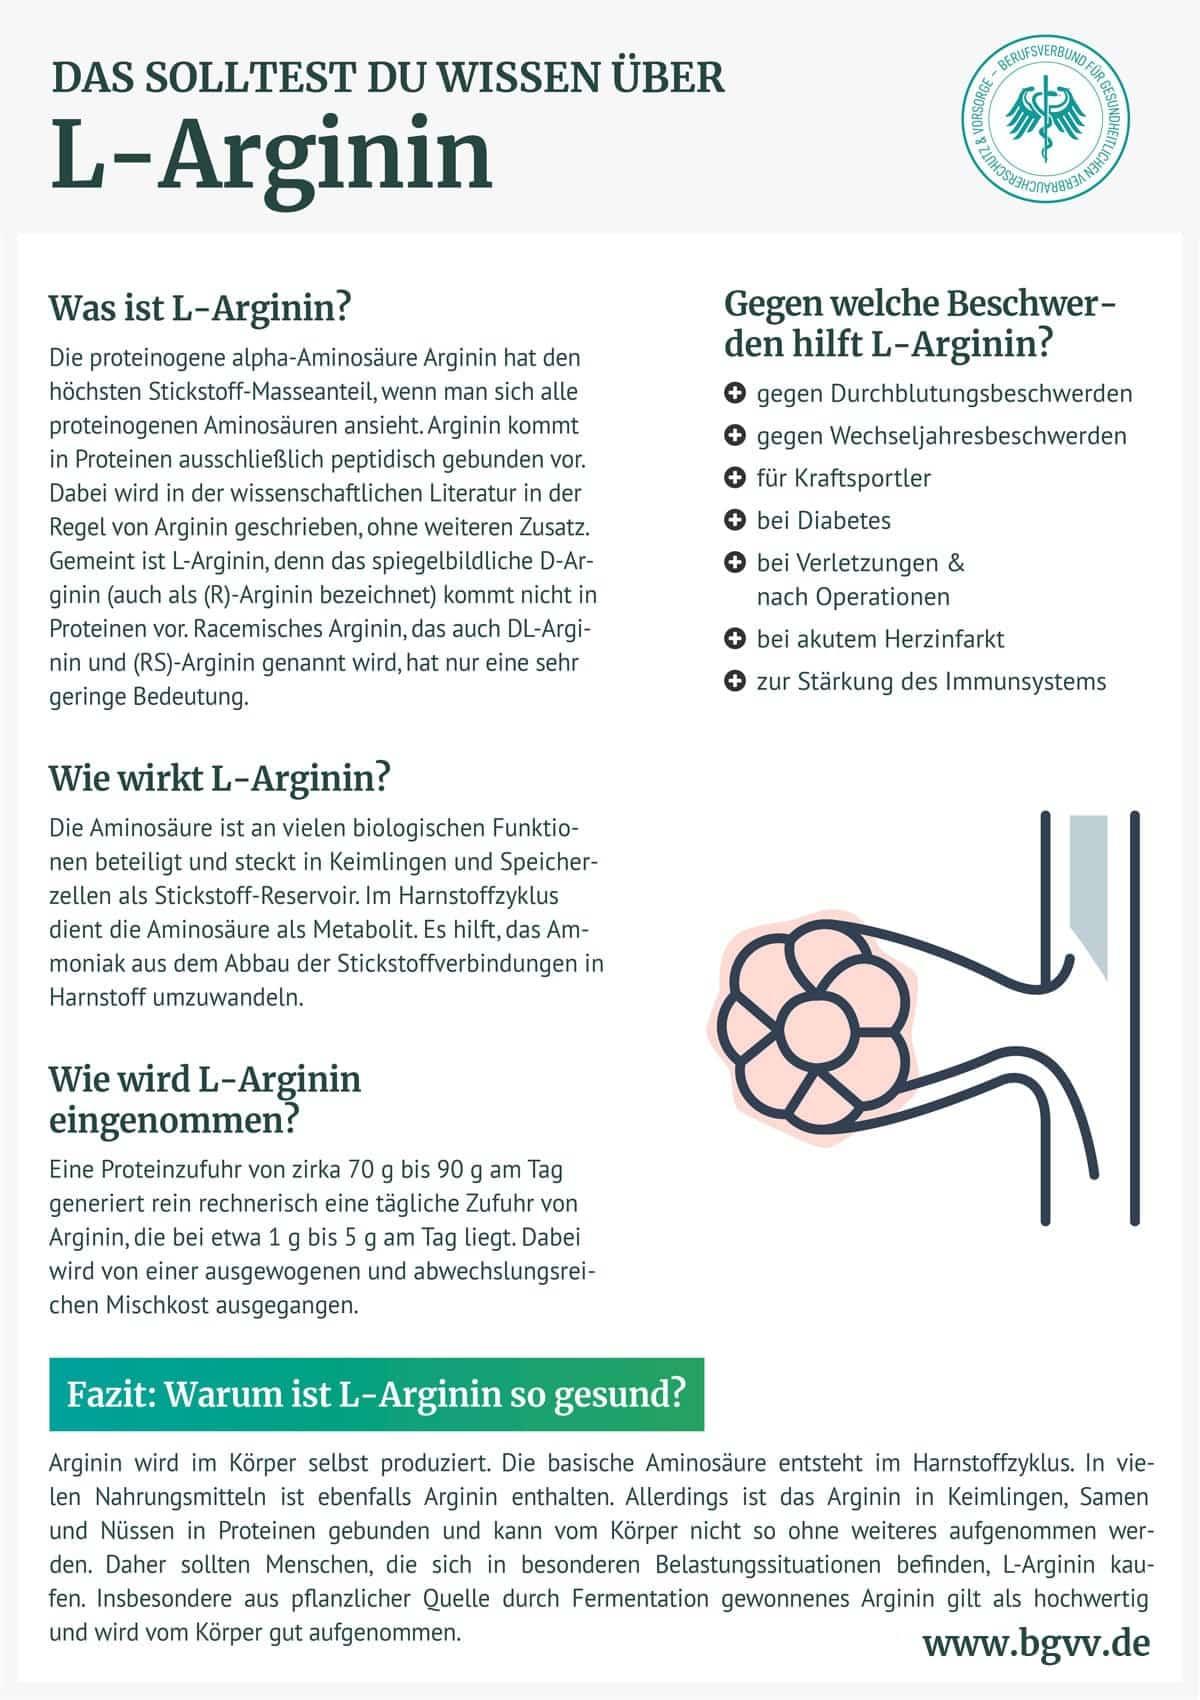 Bgvv L-Arginin Infografik